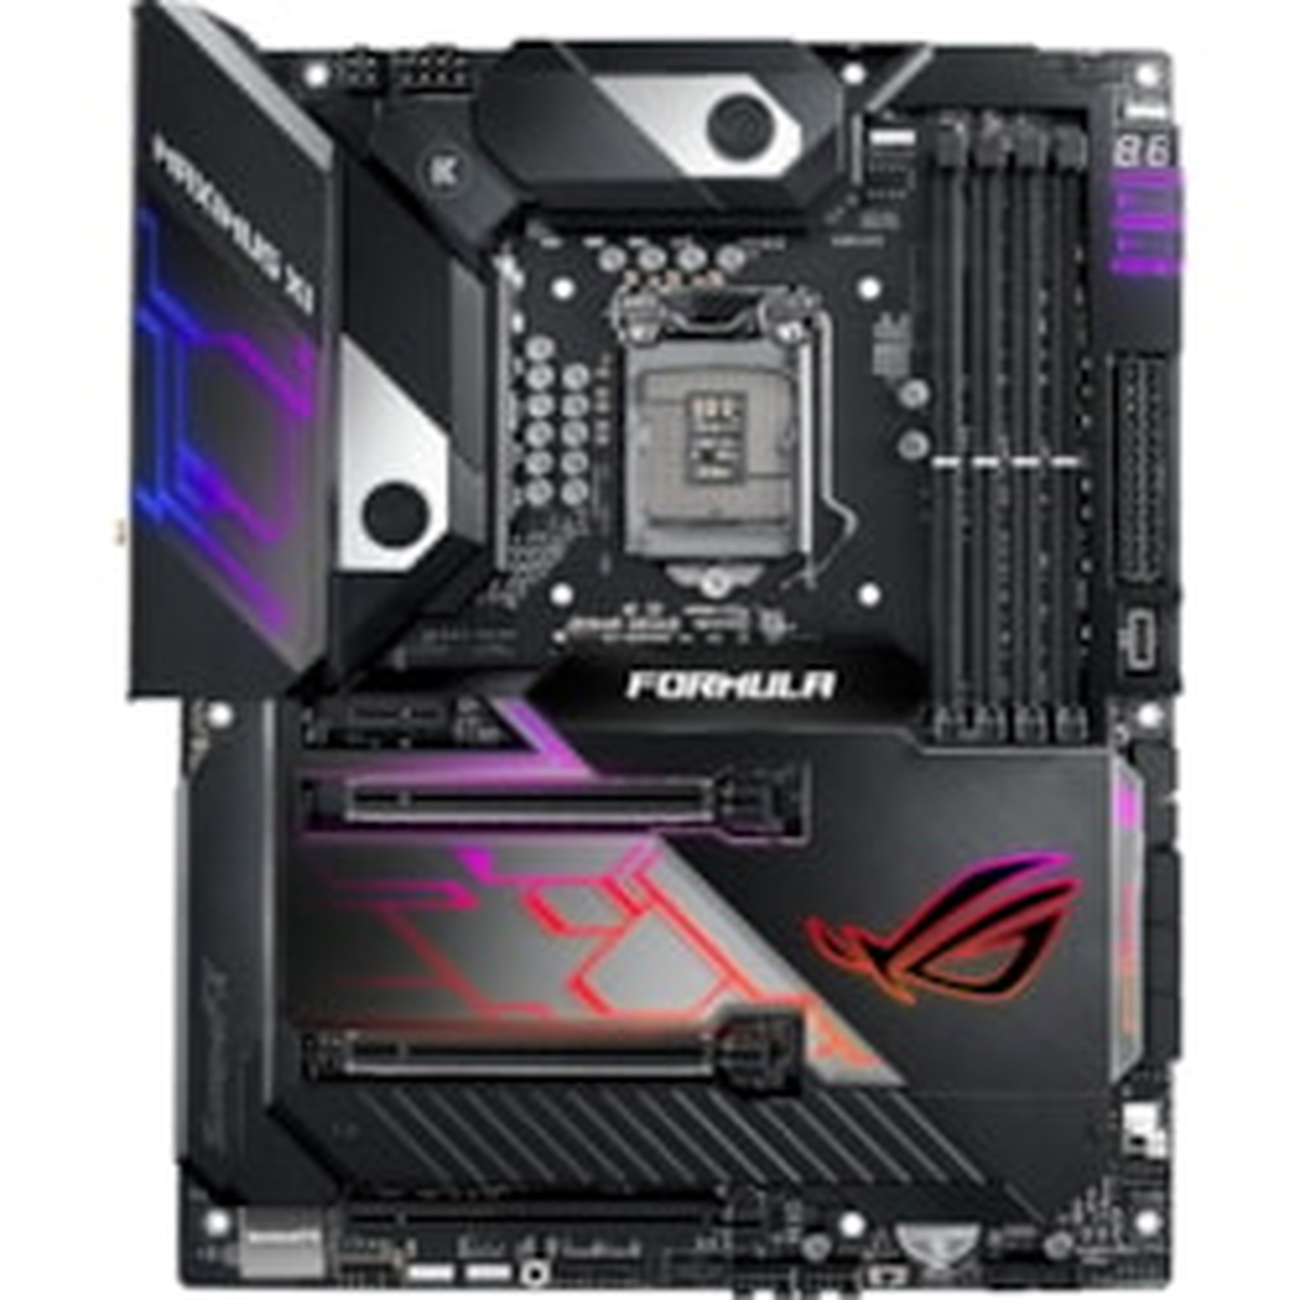 ROG MAXIMUS XI FORMULA Desktop Motherboard - Intel Chipset - Socket H4 LGA-1151